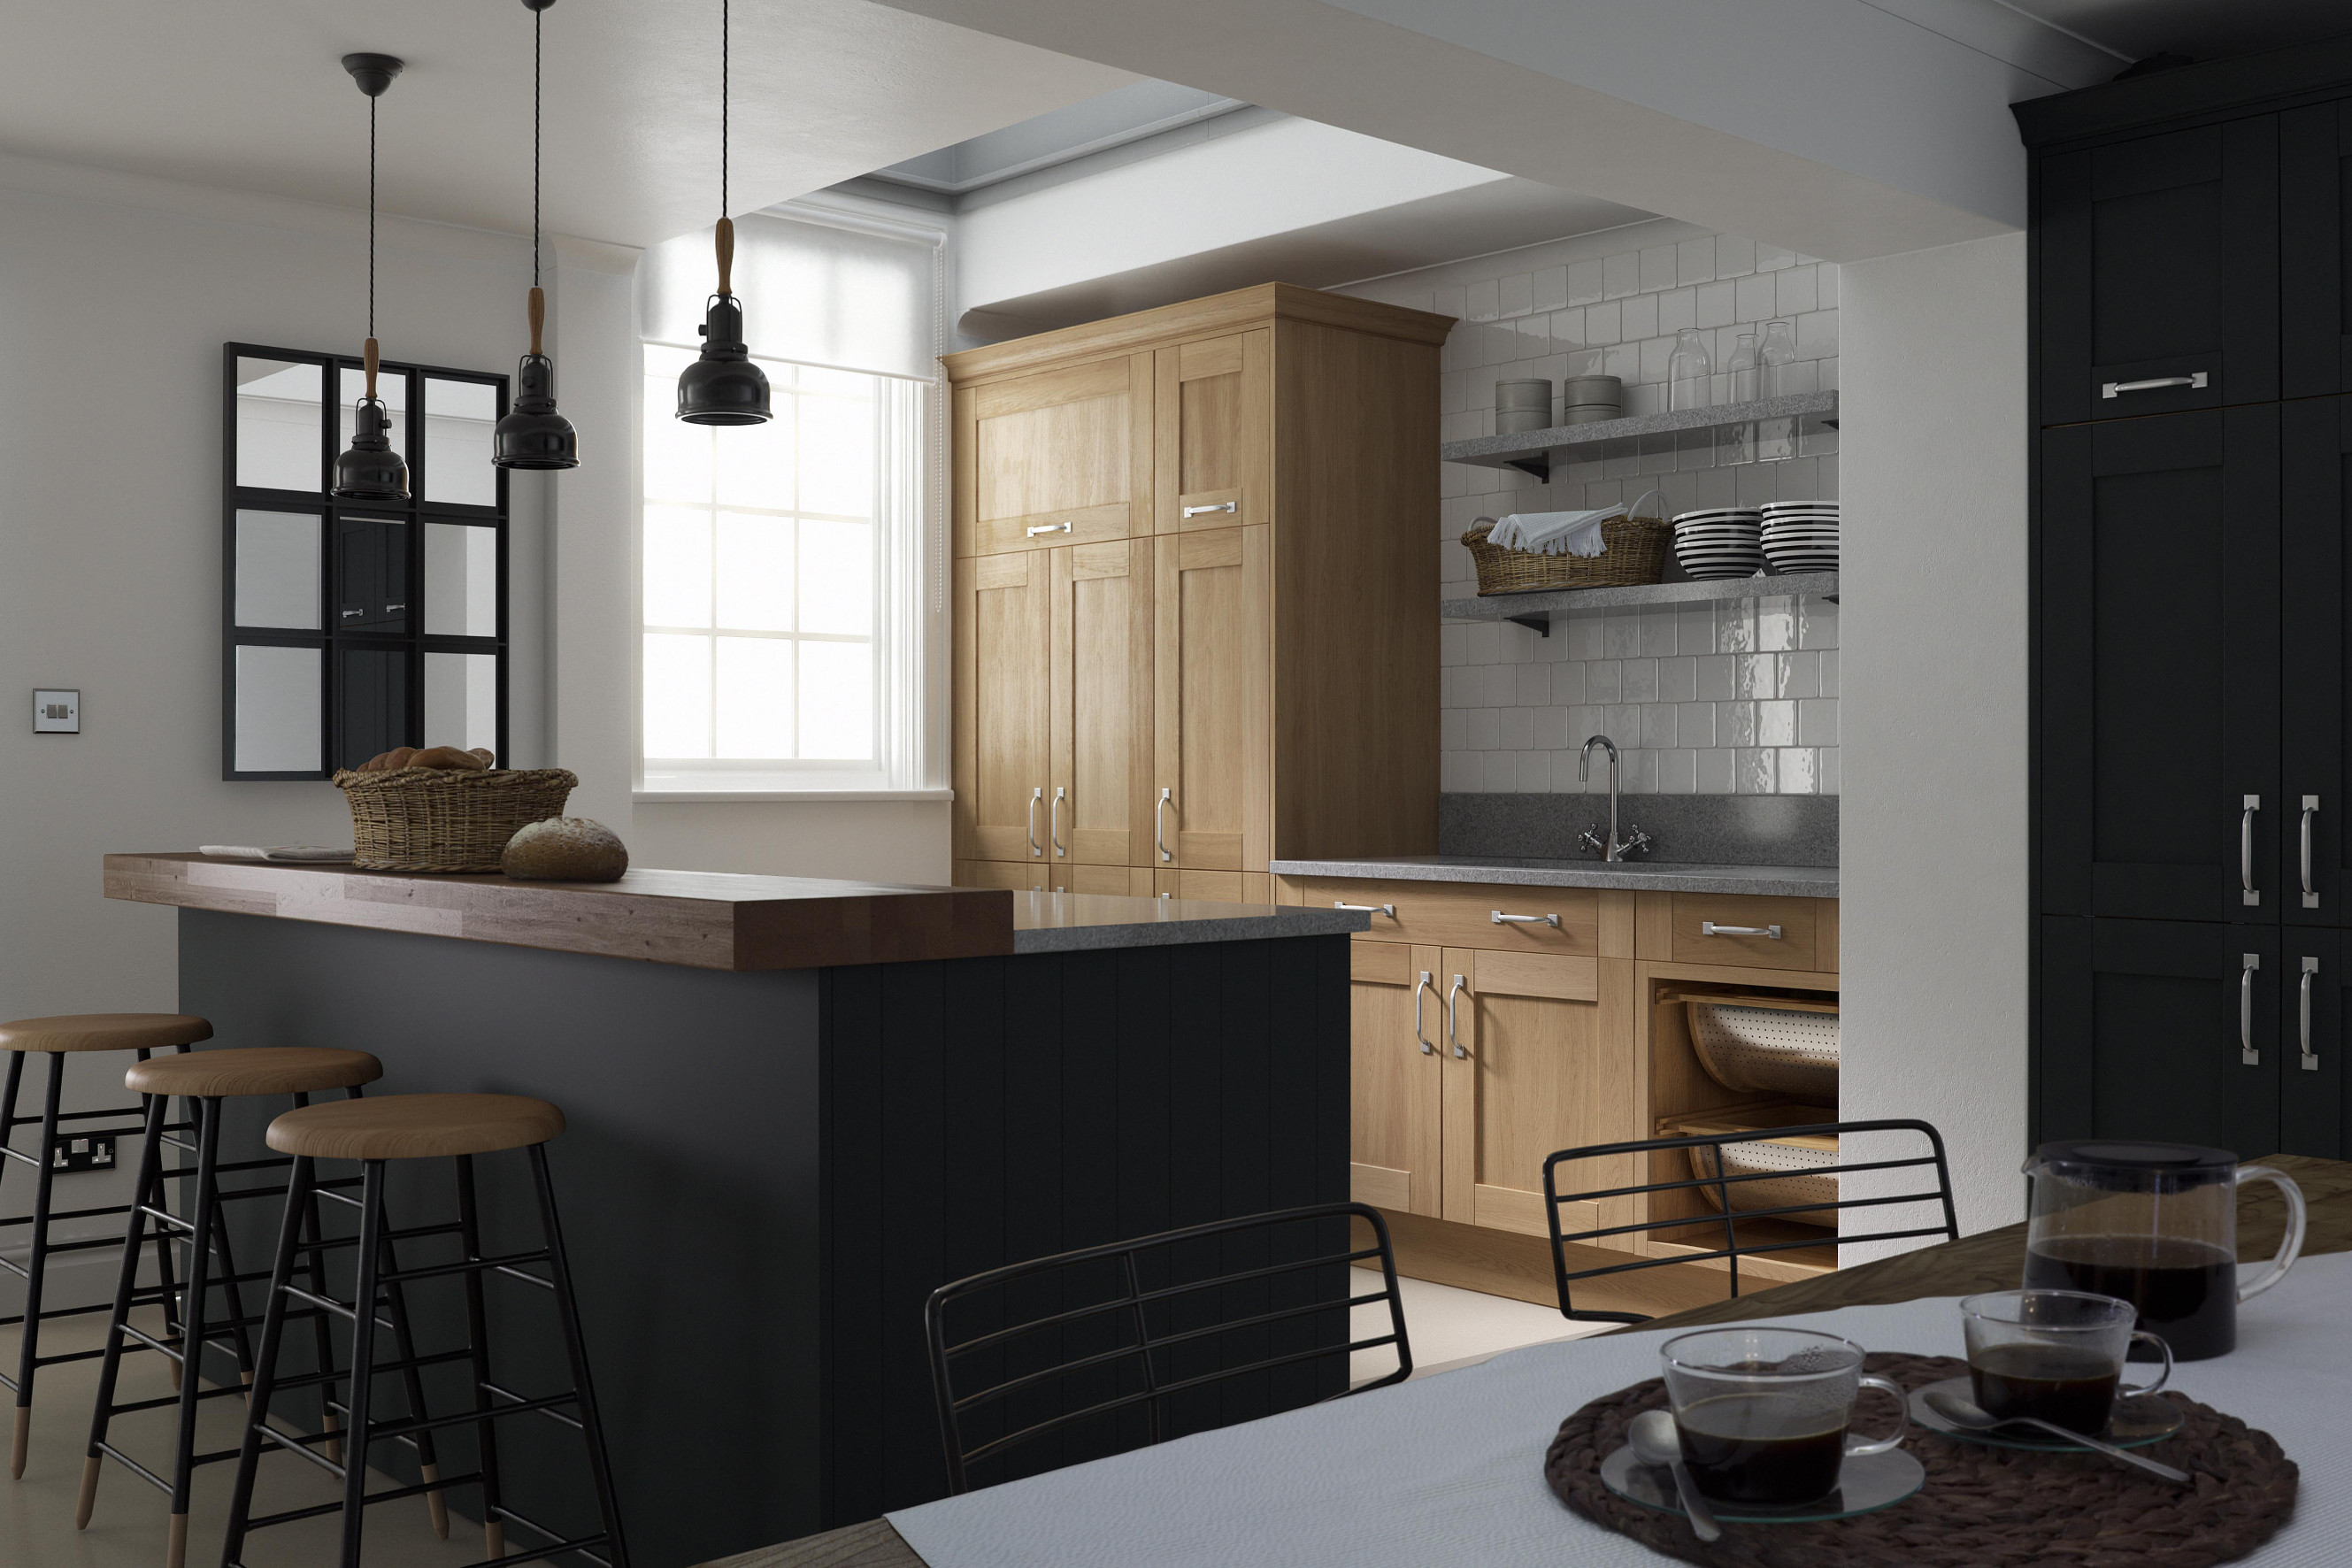 50 shades of grey sultry kitchen design wren kitchens blog On linda barker kitchens